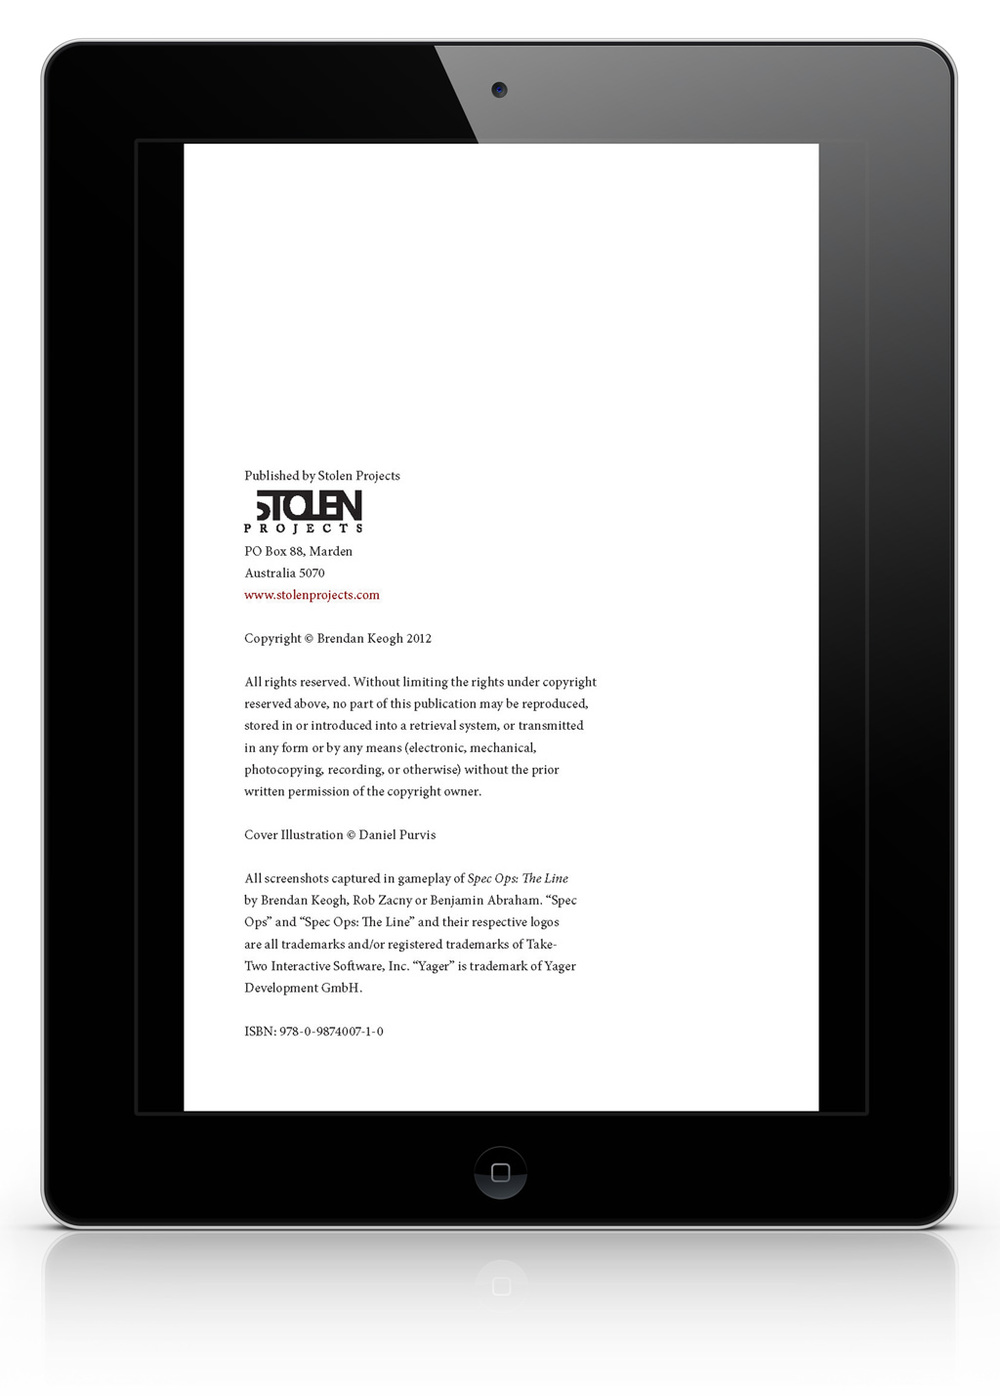 iPad-Retina-Display-Mockup6.jpg